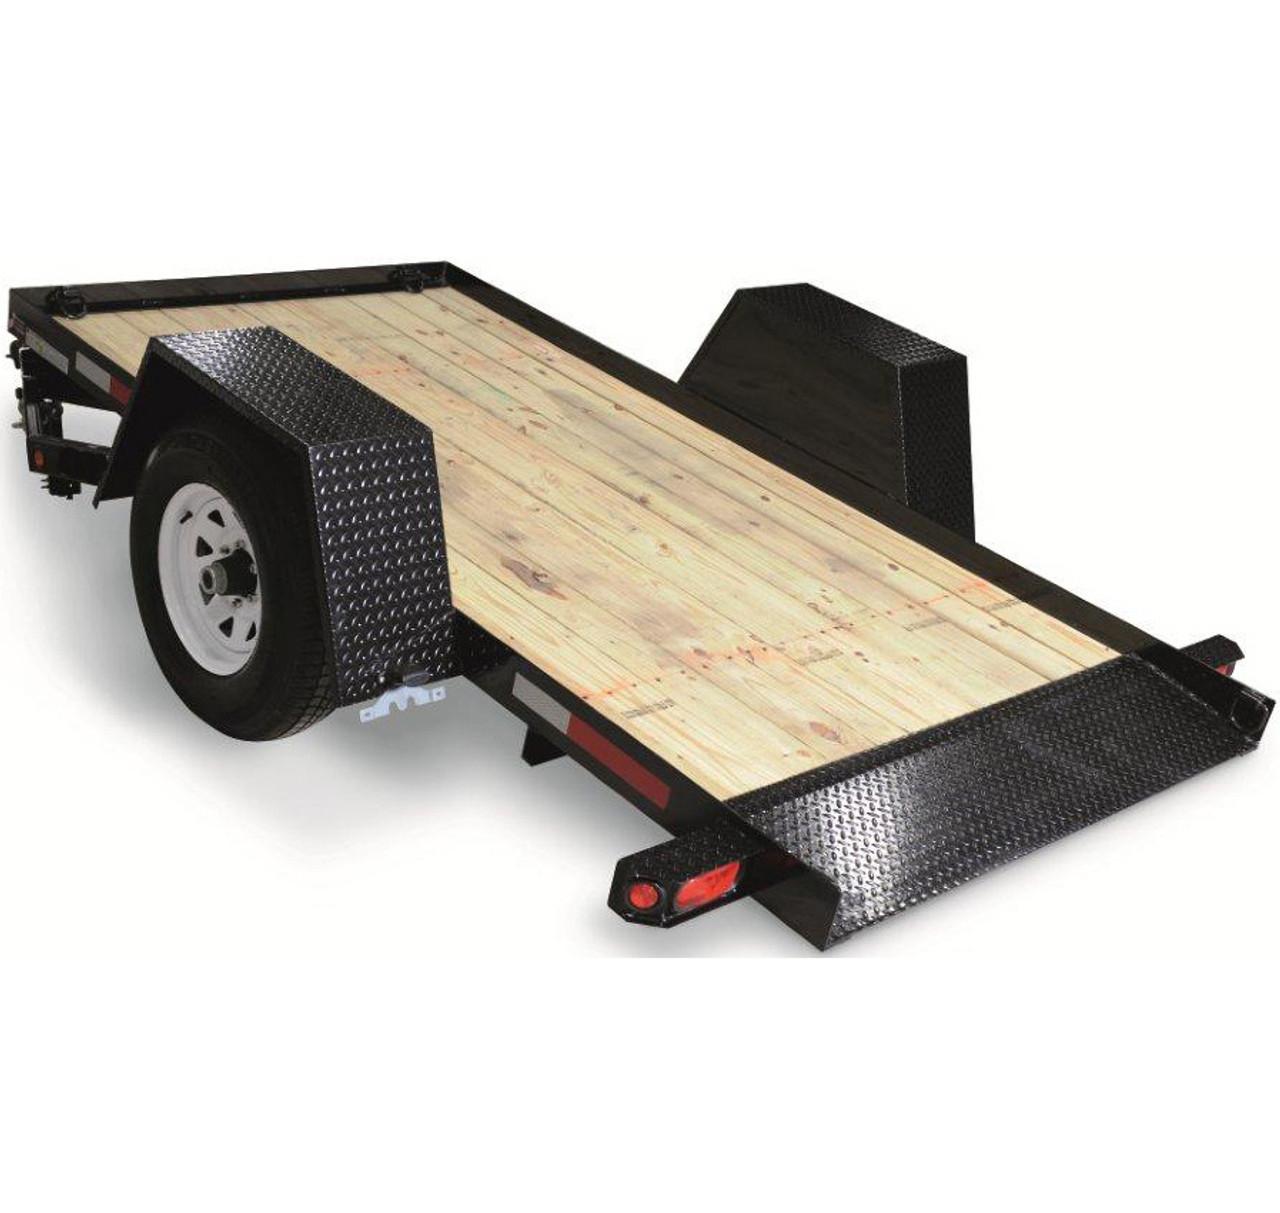 CT6012TSA4HY --- 6' x 12' Pan Tilt-Bed with Hydraulic Brakes